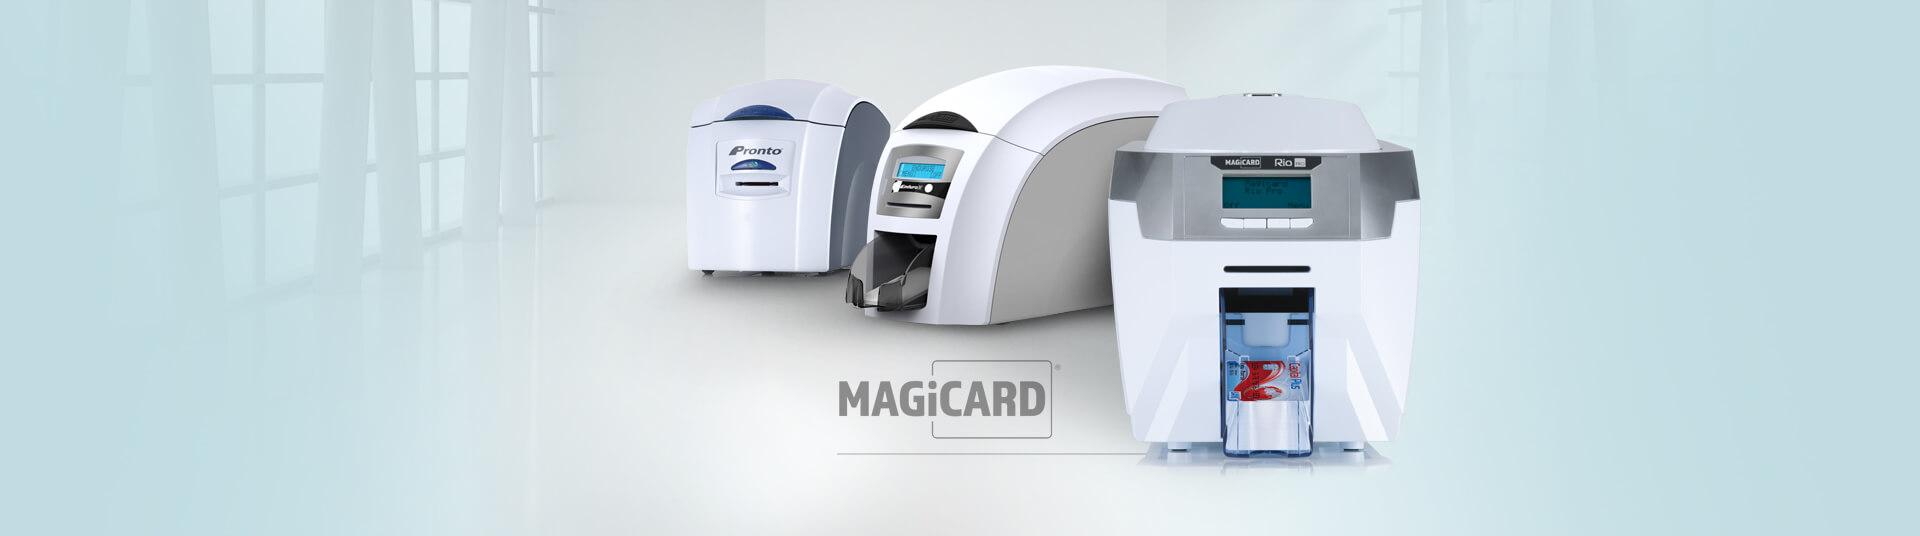 Magicard ID Machines